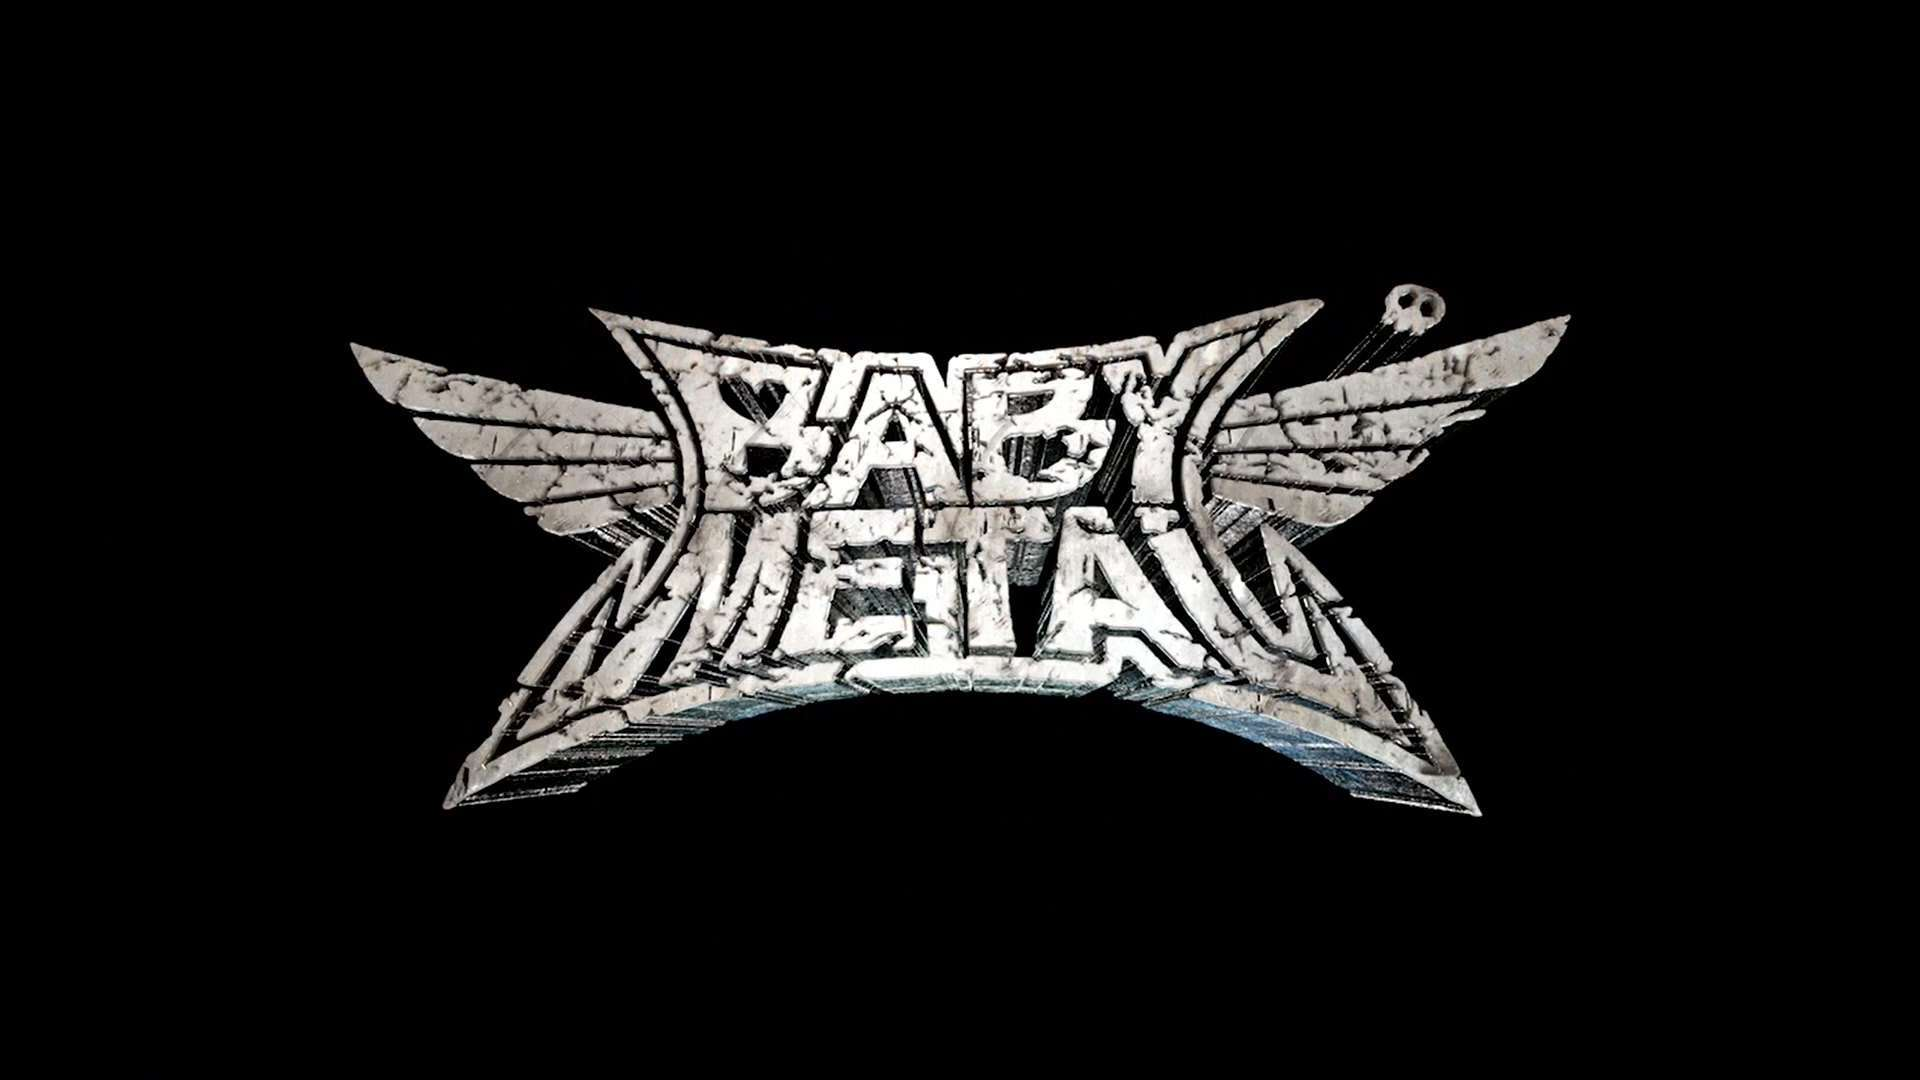 Free Download Wallpaper Babymetal Logo Wallpaper Hd 1080p Upload